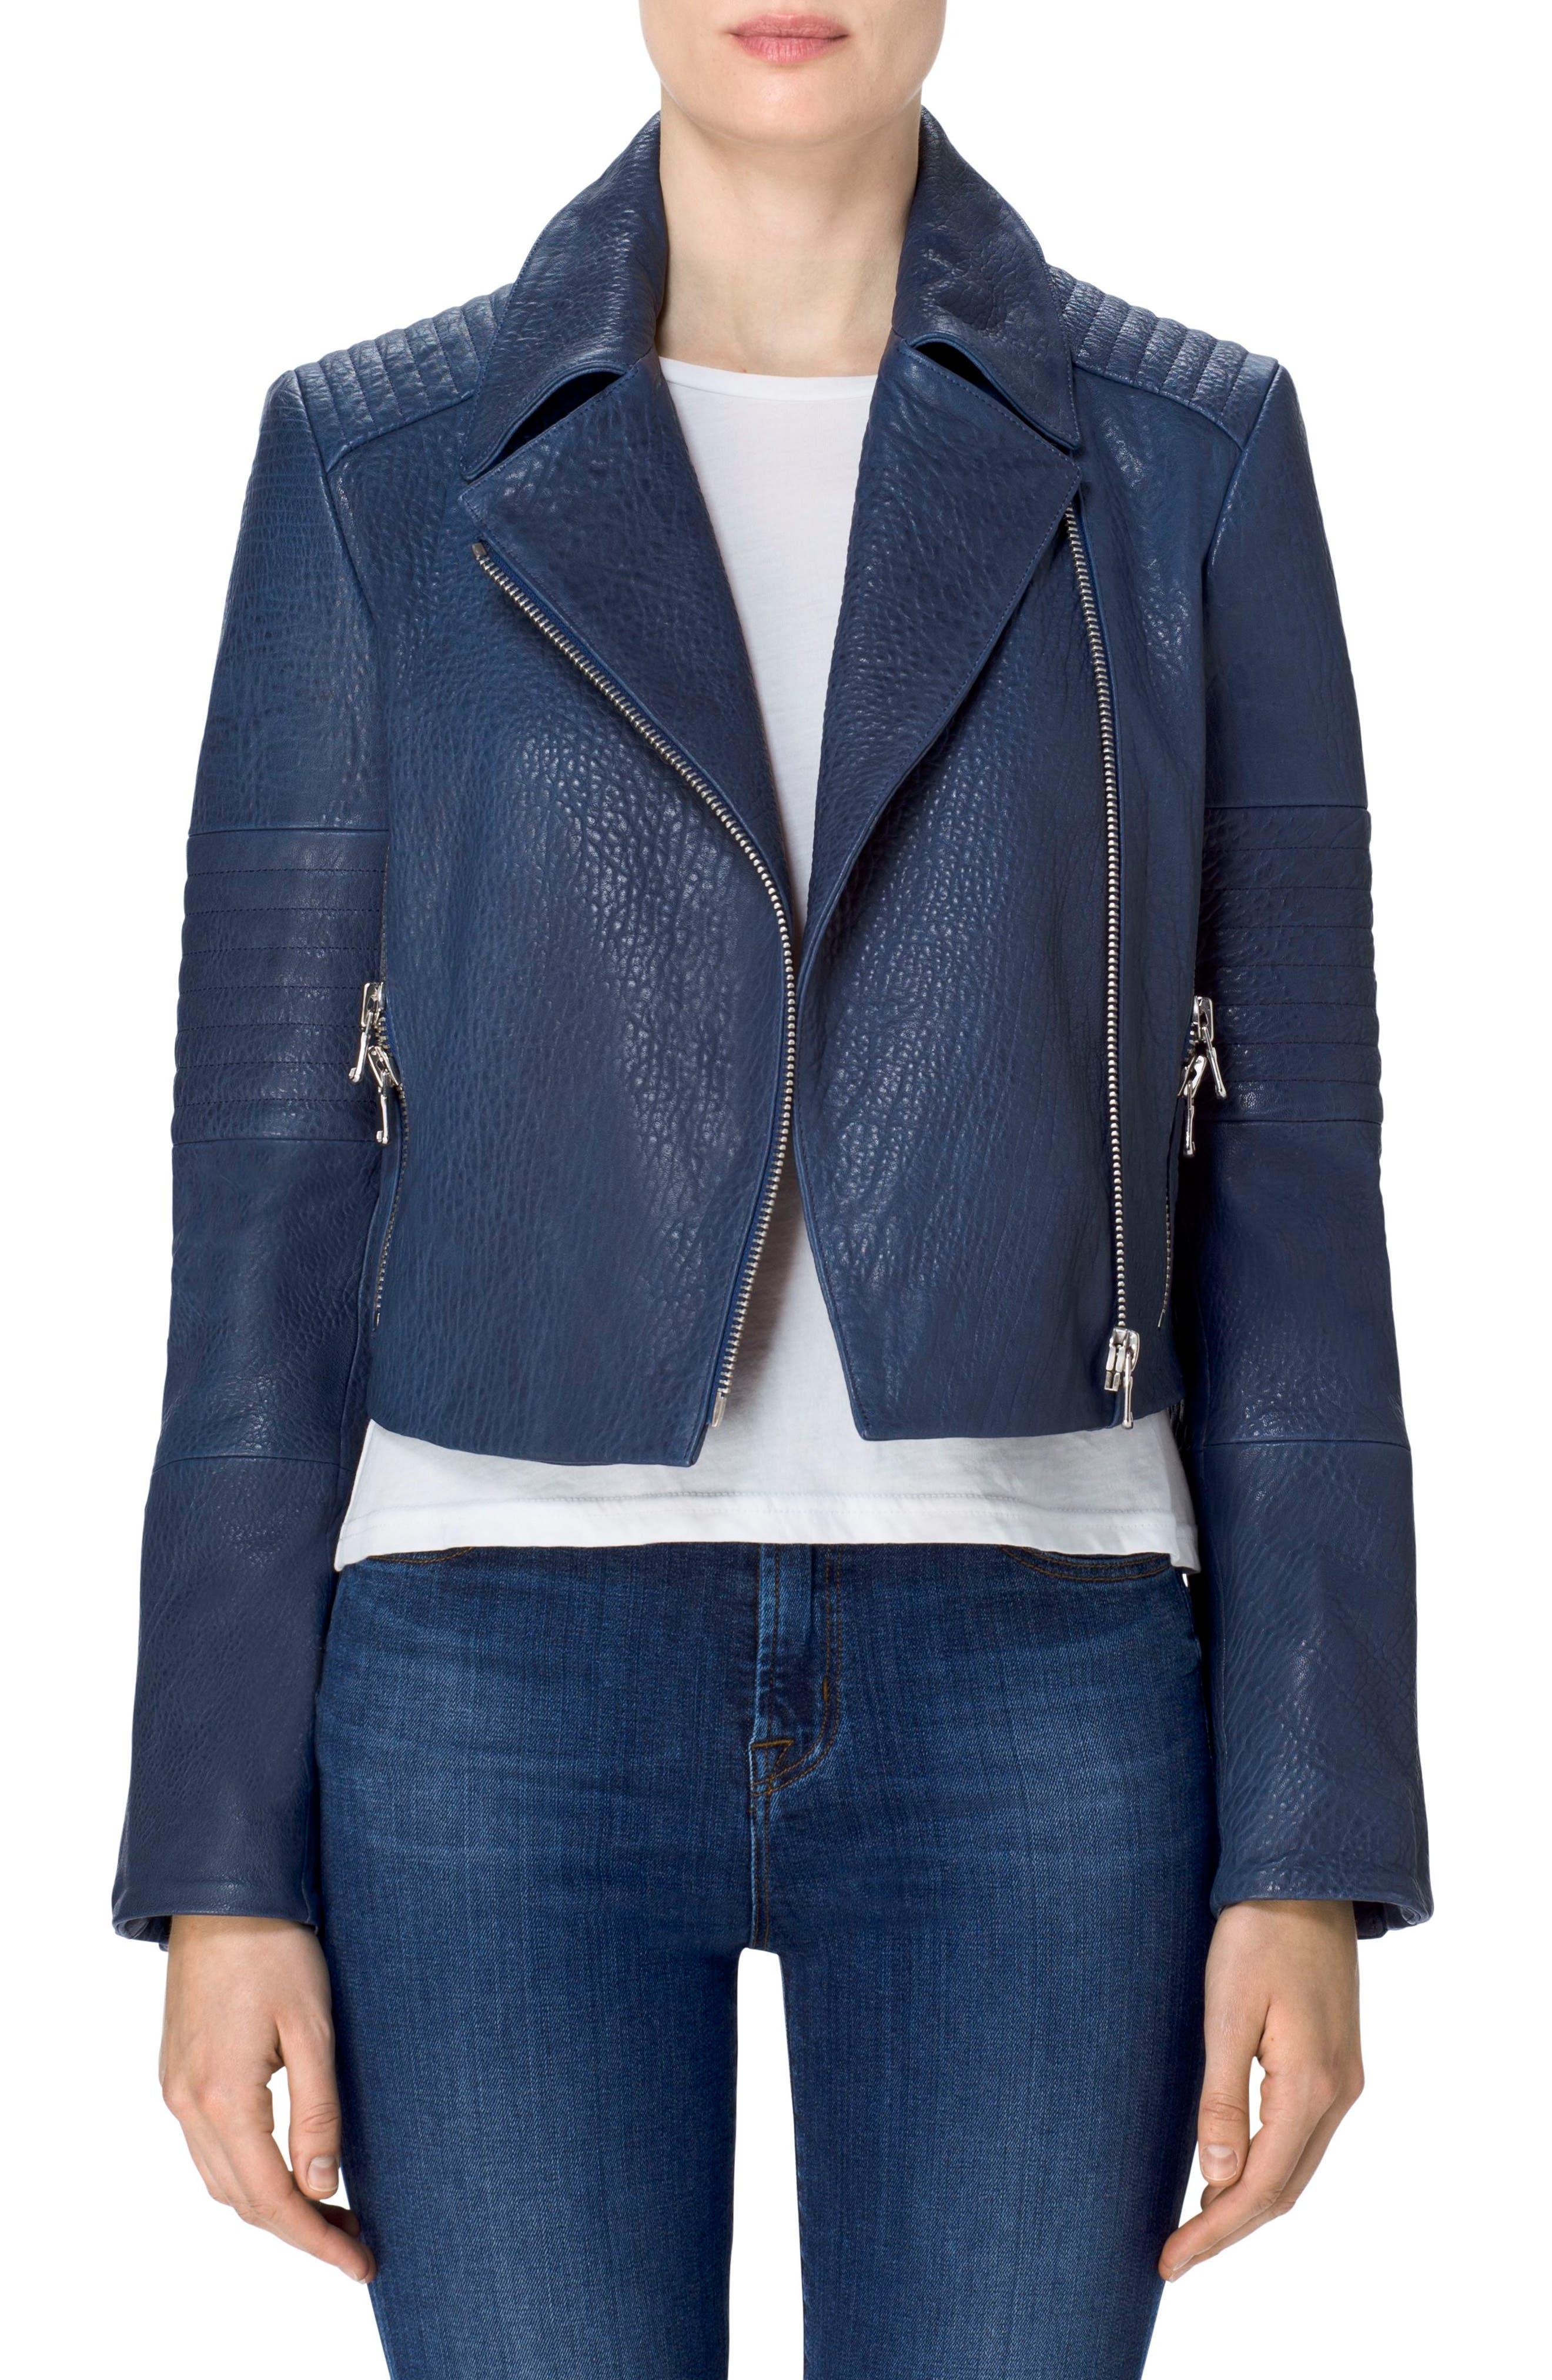 Alternate Image 1 Selected - J Brand Aiah Leather Moto Jacket